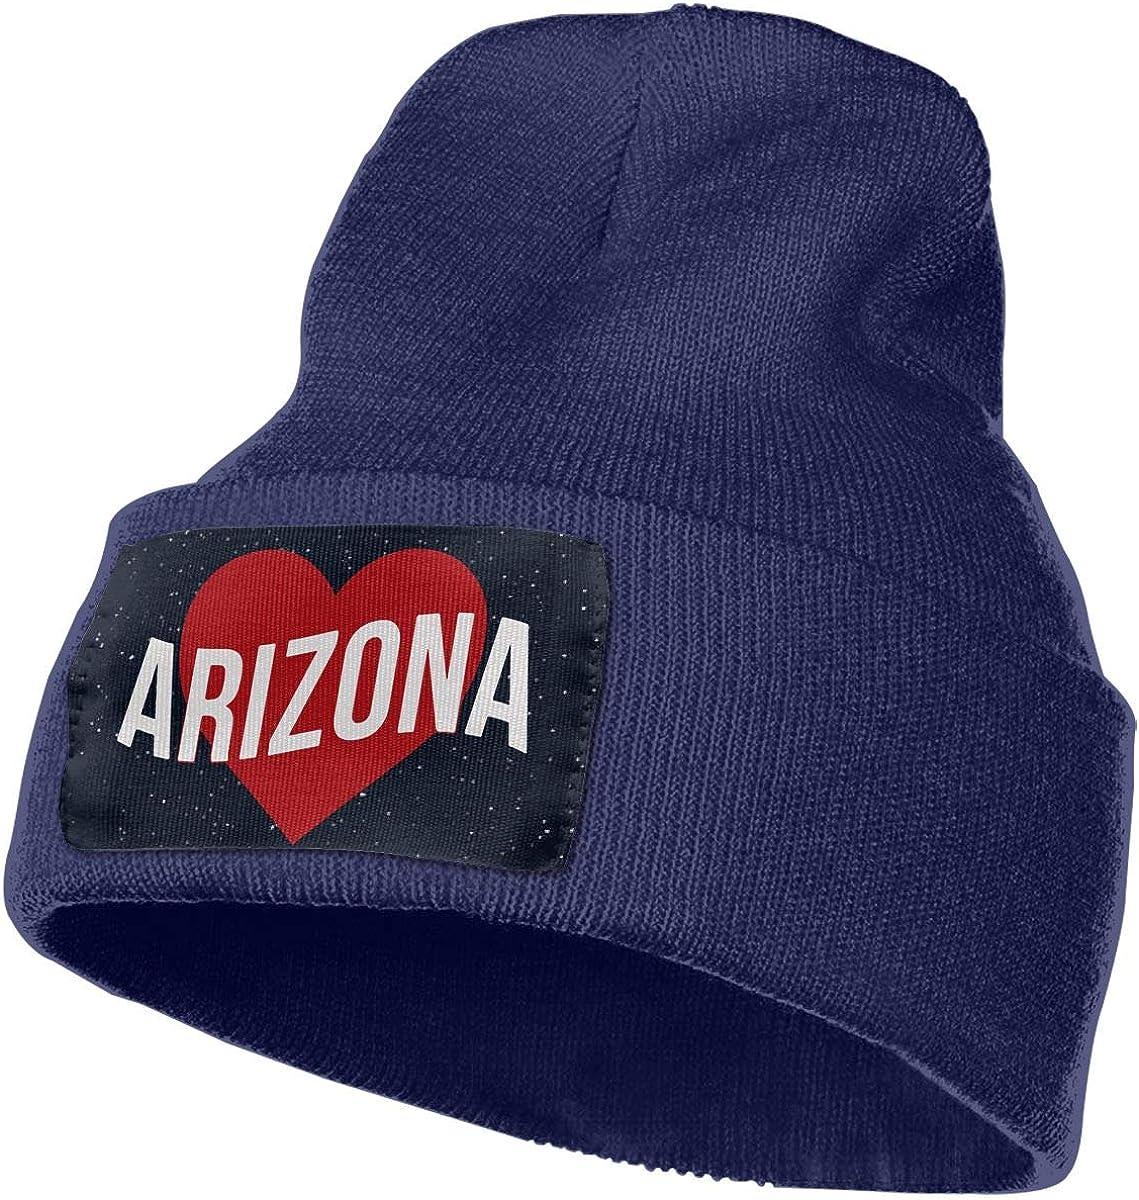 Arizona Women and Men Skull Caps Winter Warm Stretchy Knit Beanie Hats